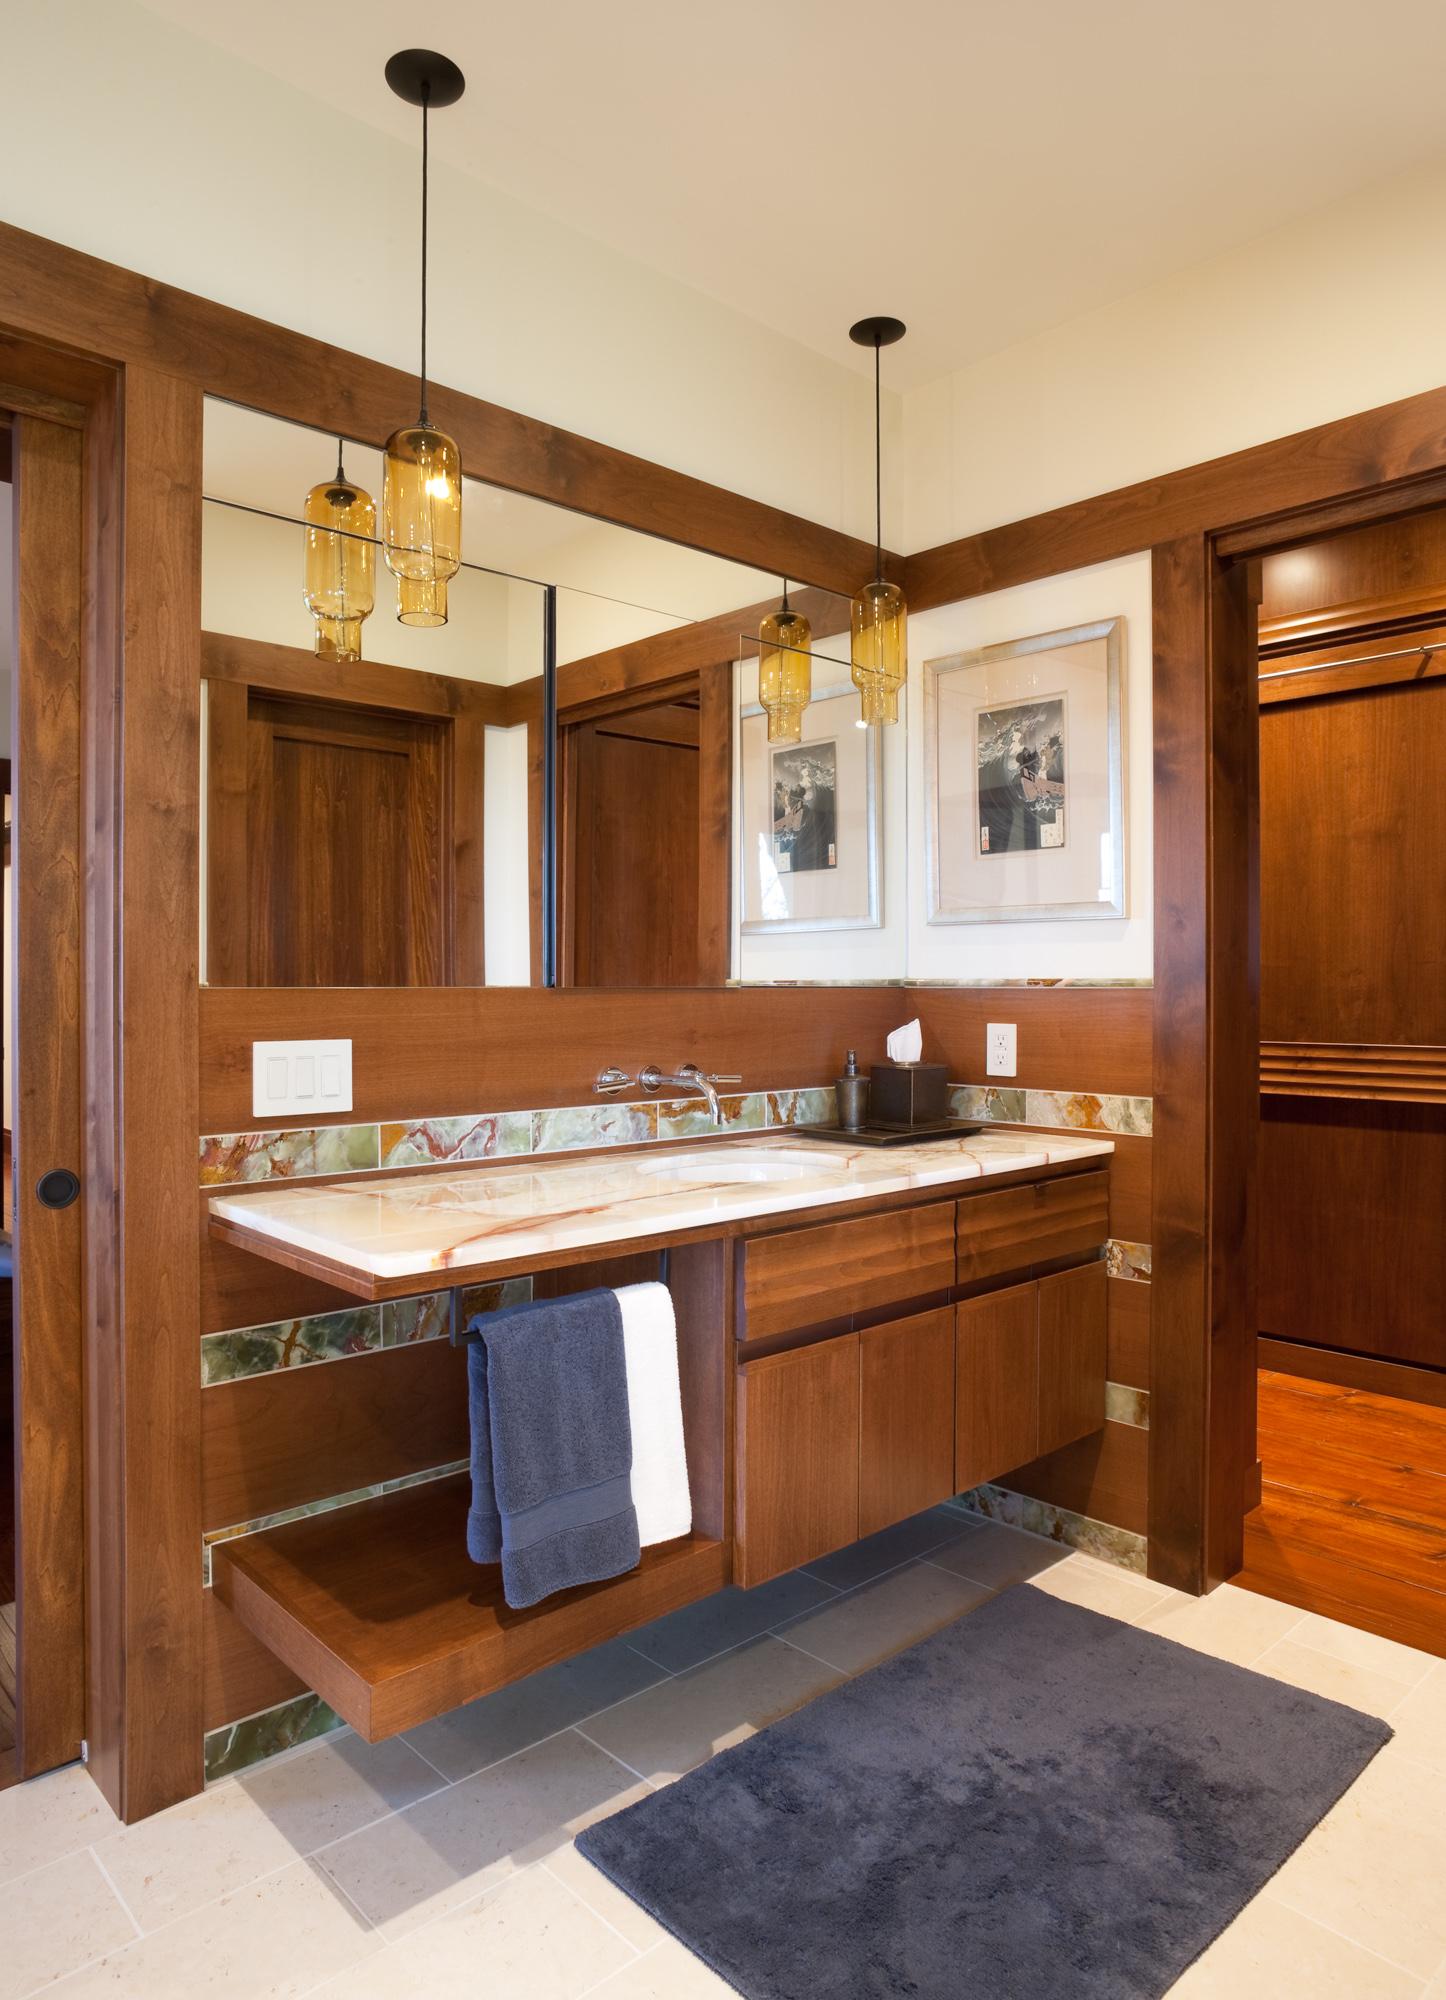 Modern bathroom pendant lighting - Bathroom Lighting Pendants Fresh Pendant Lighting For Bathroom Home Decor